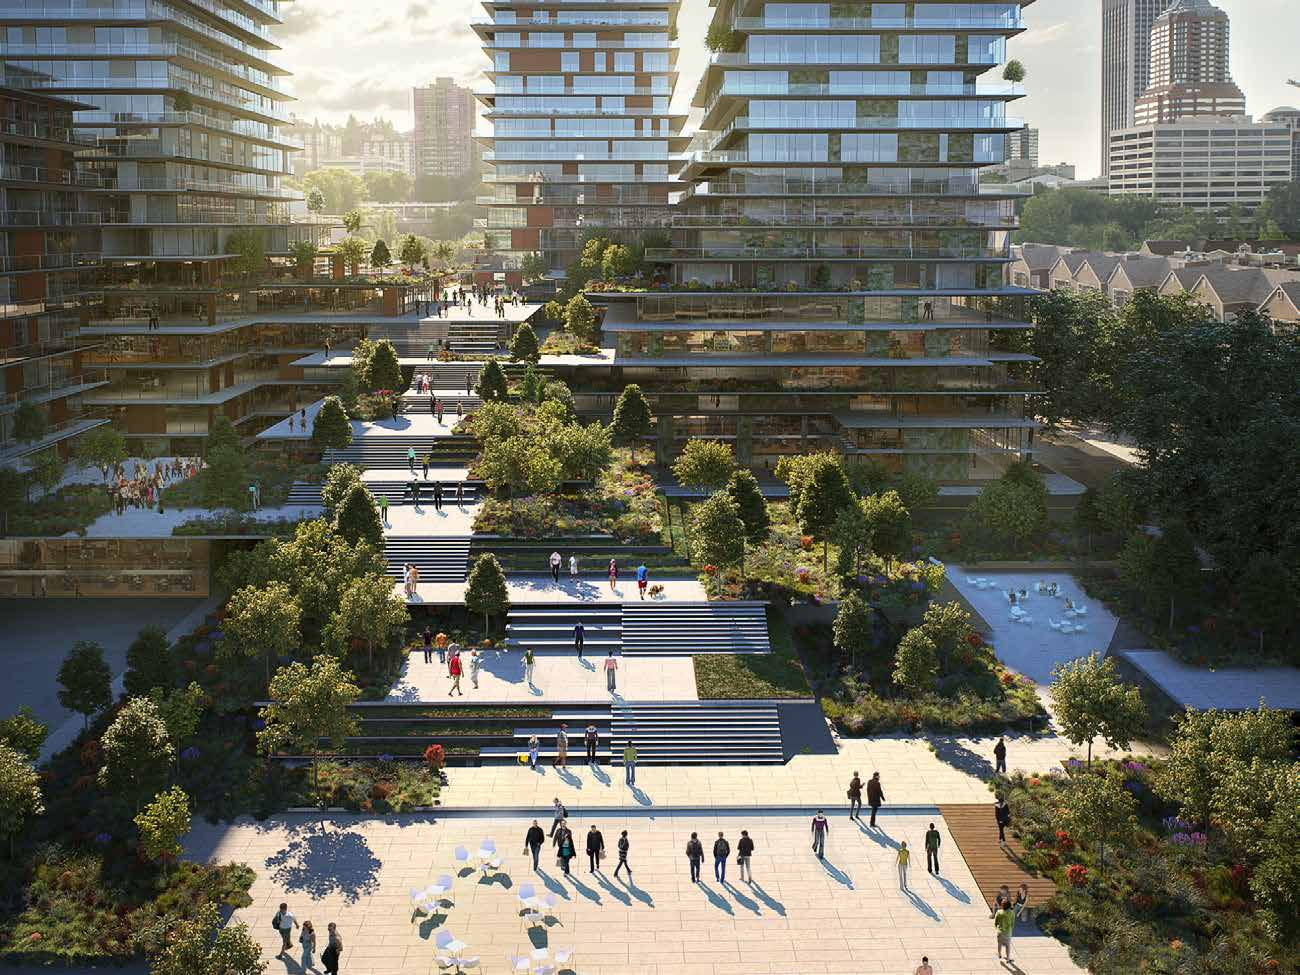 Riverplace Redevelopment